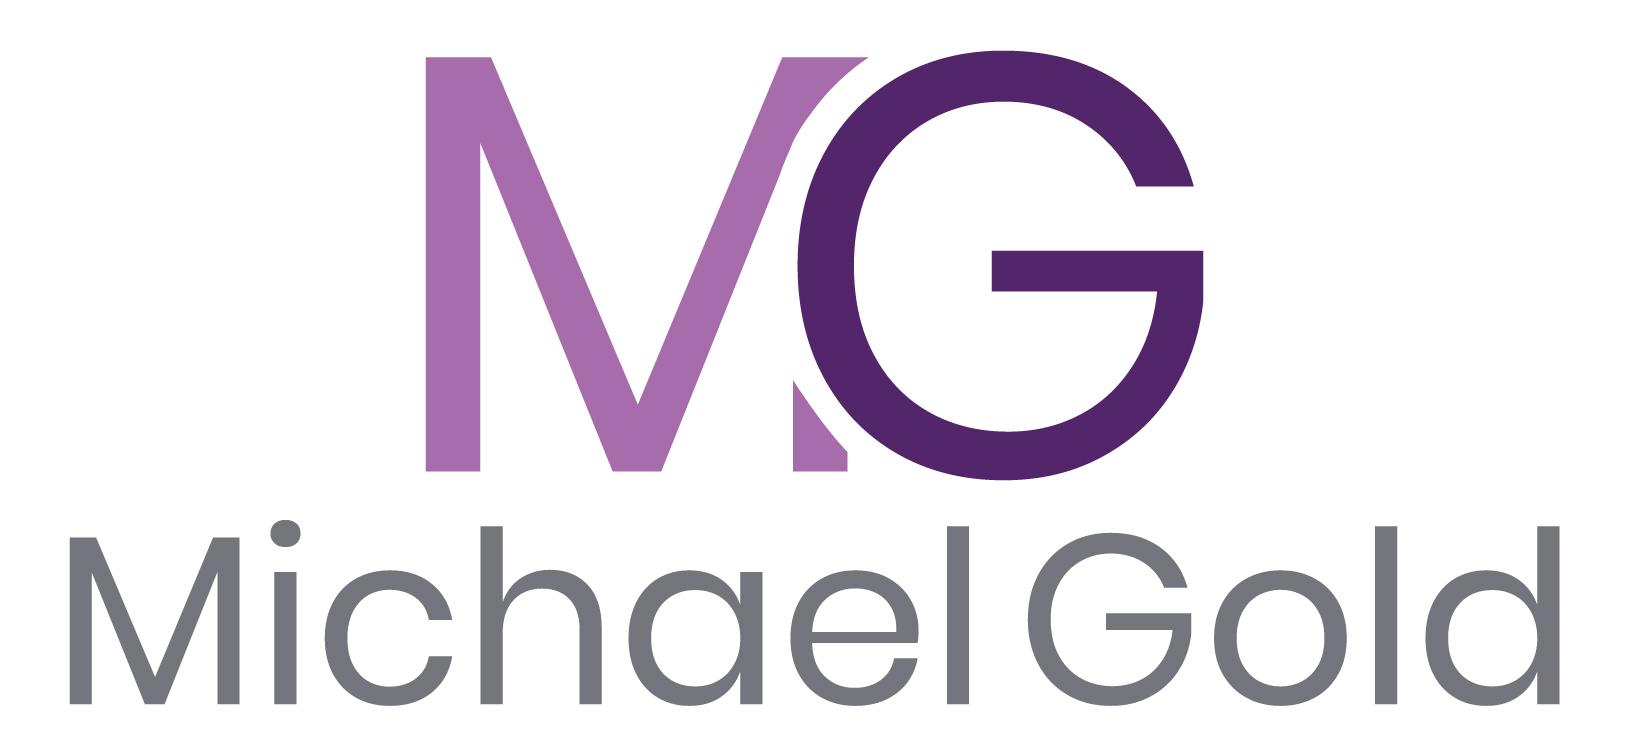 Michael Ethan Gold